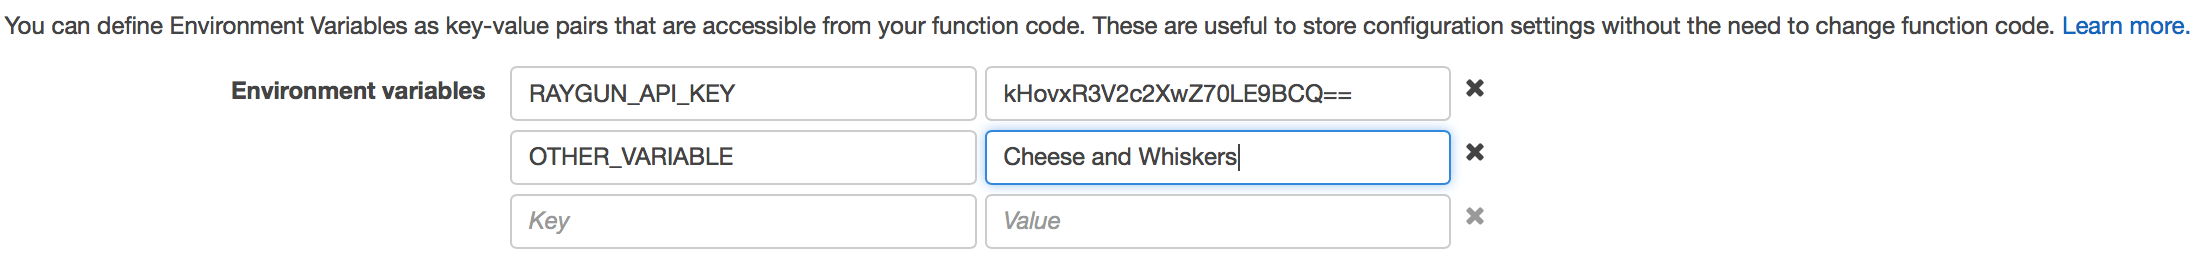 aws lambda other variable key value